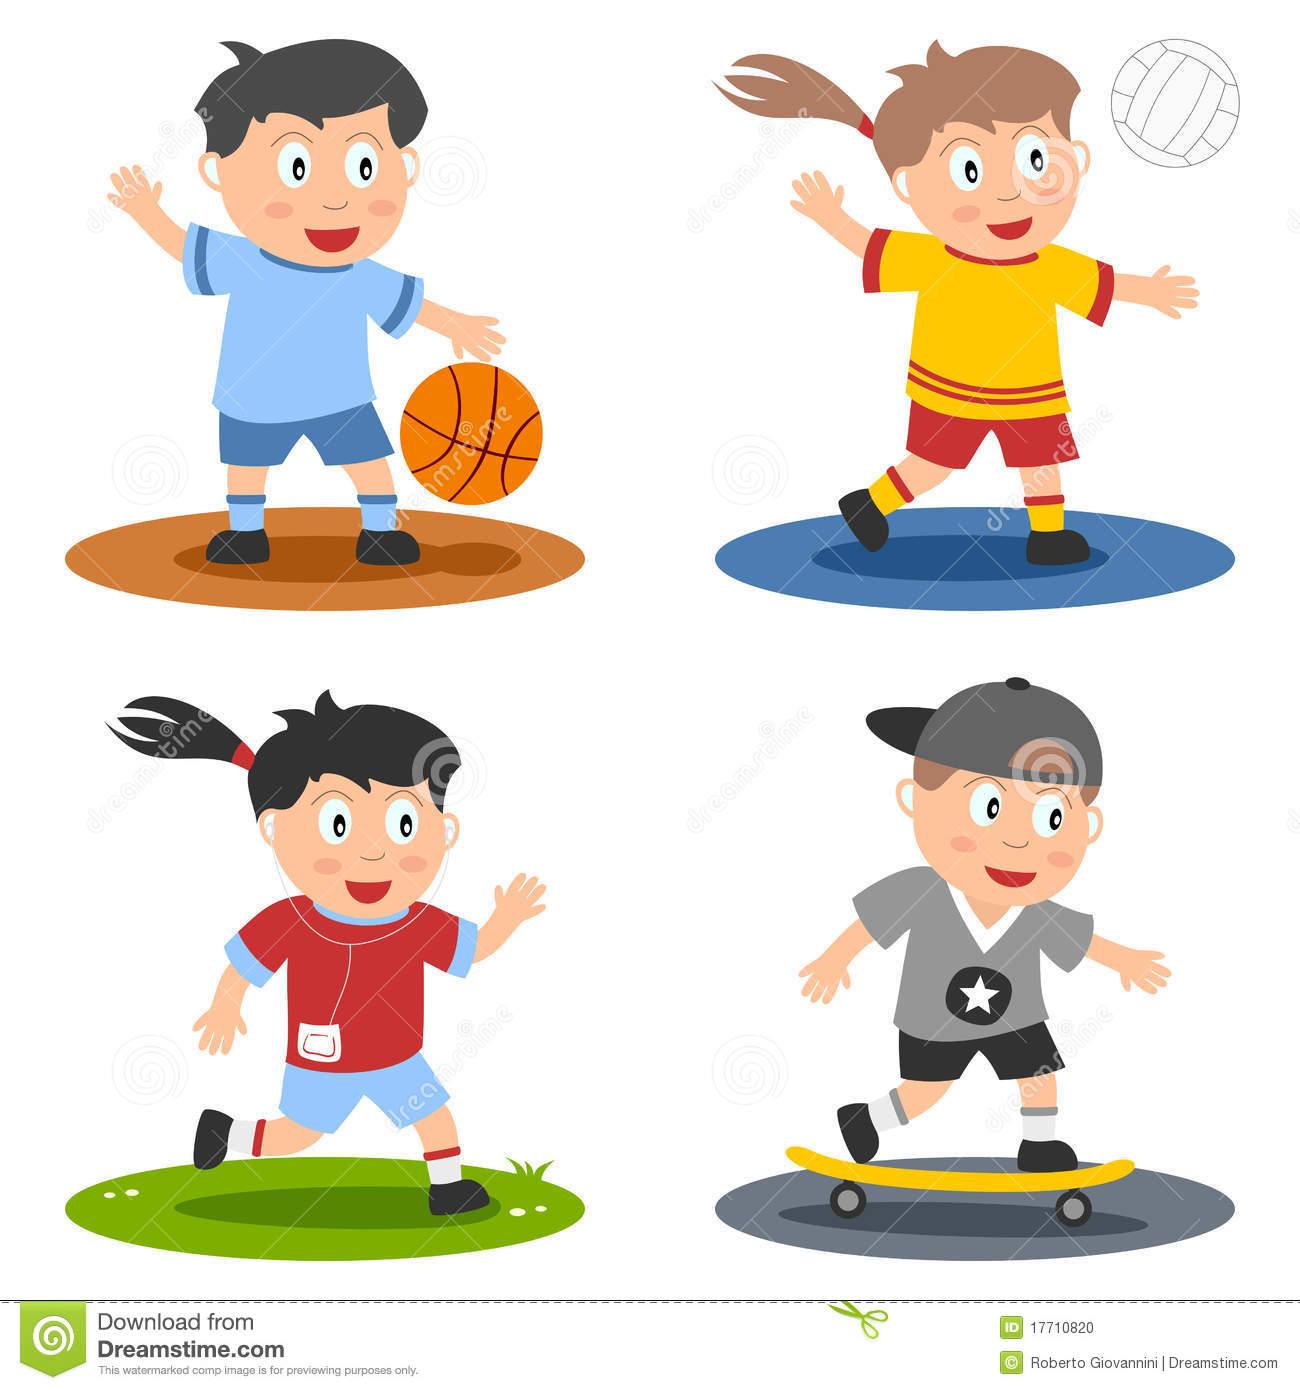 Children clipart sport. Station